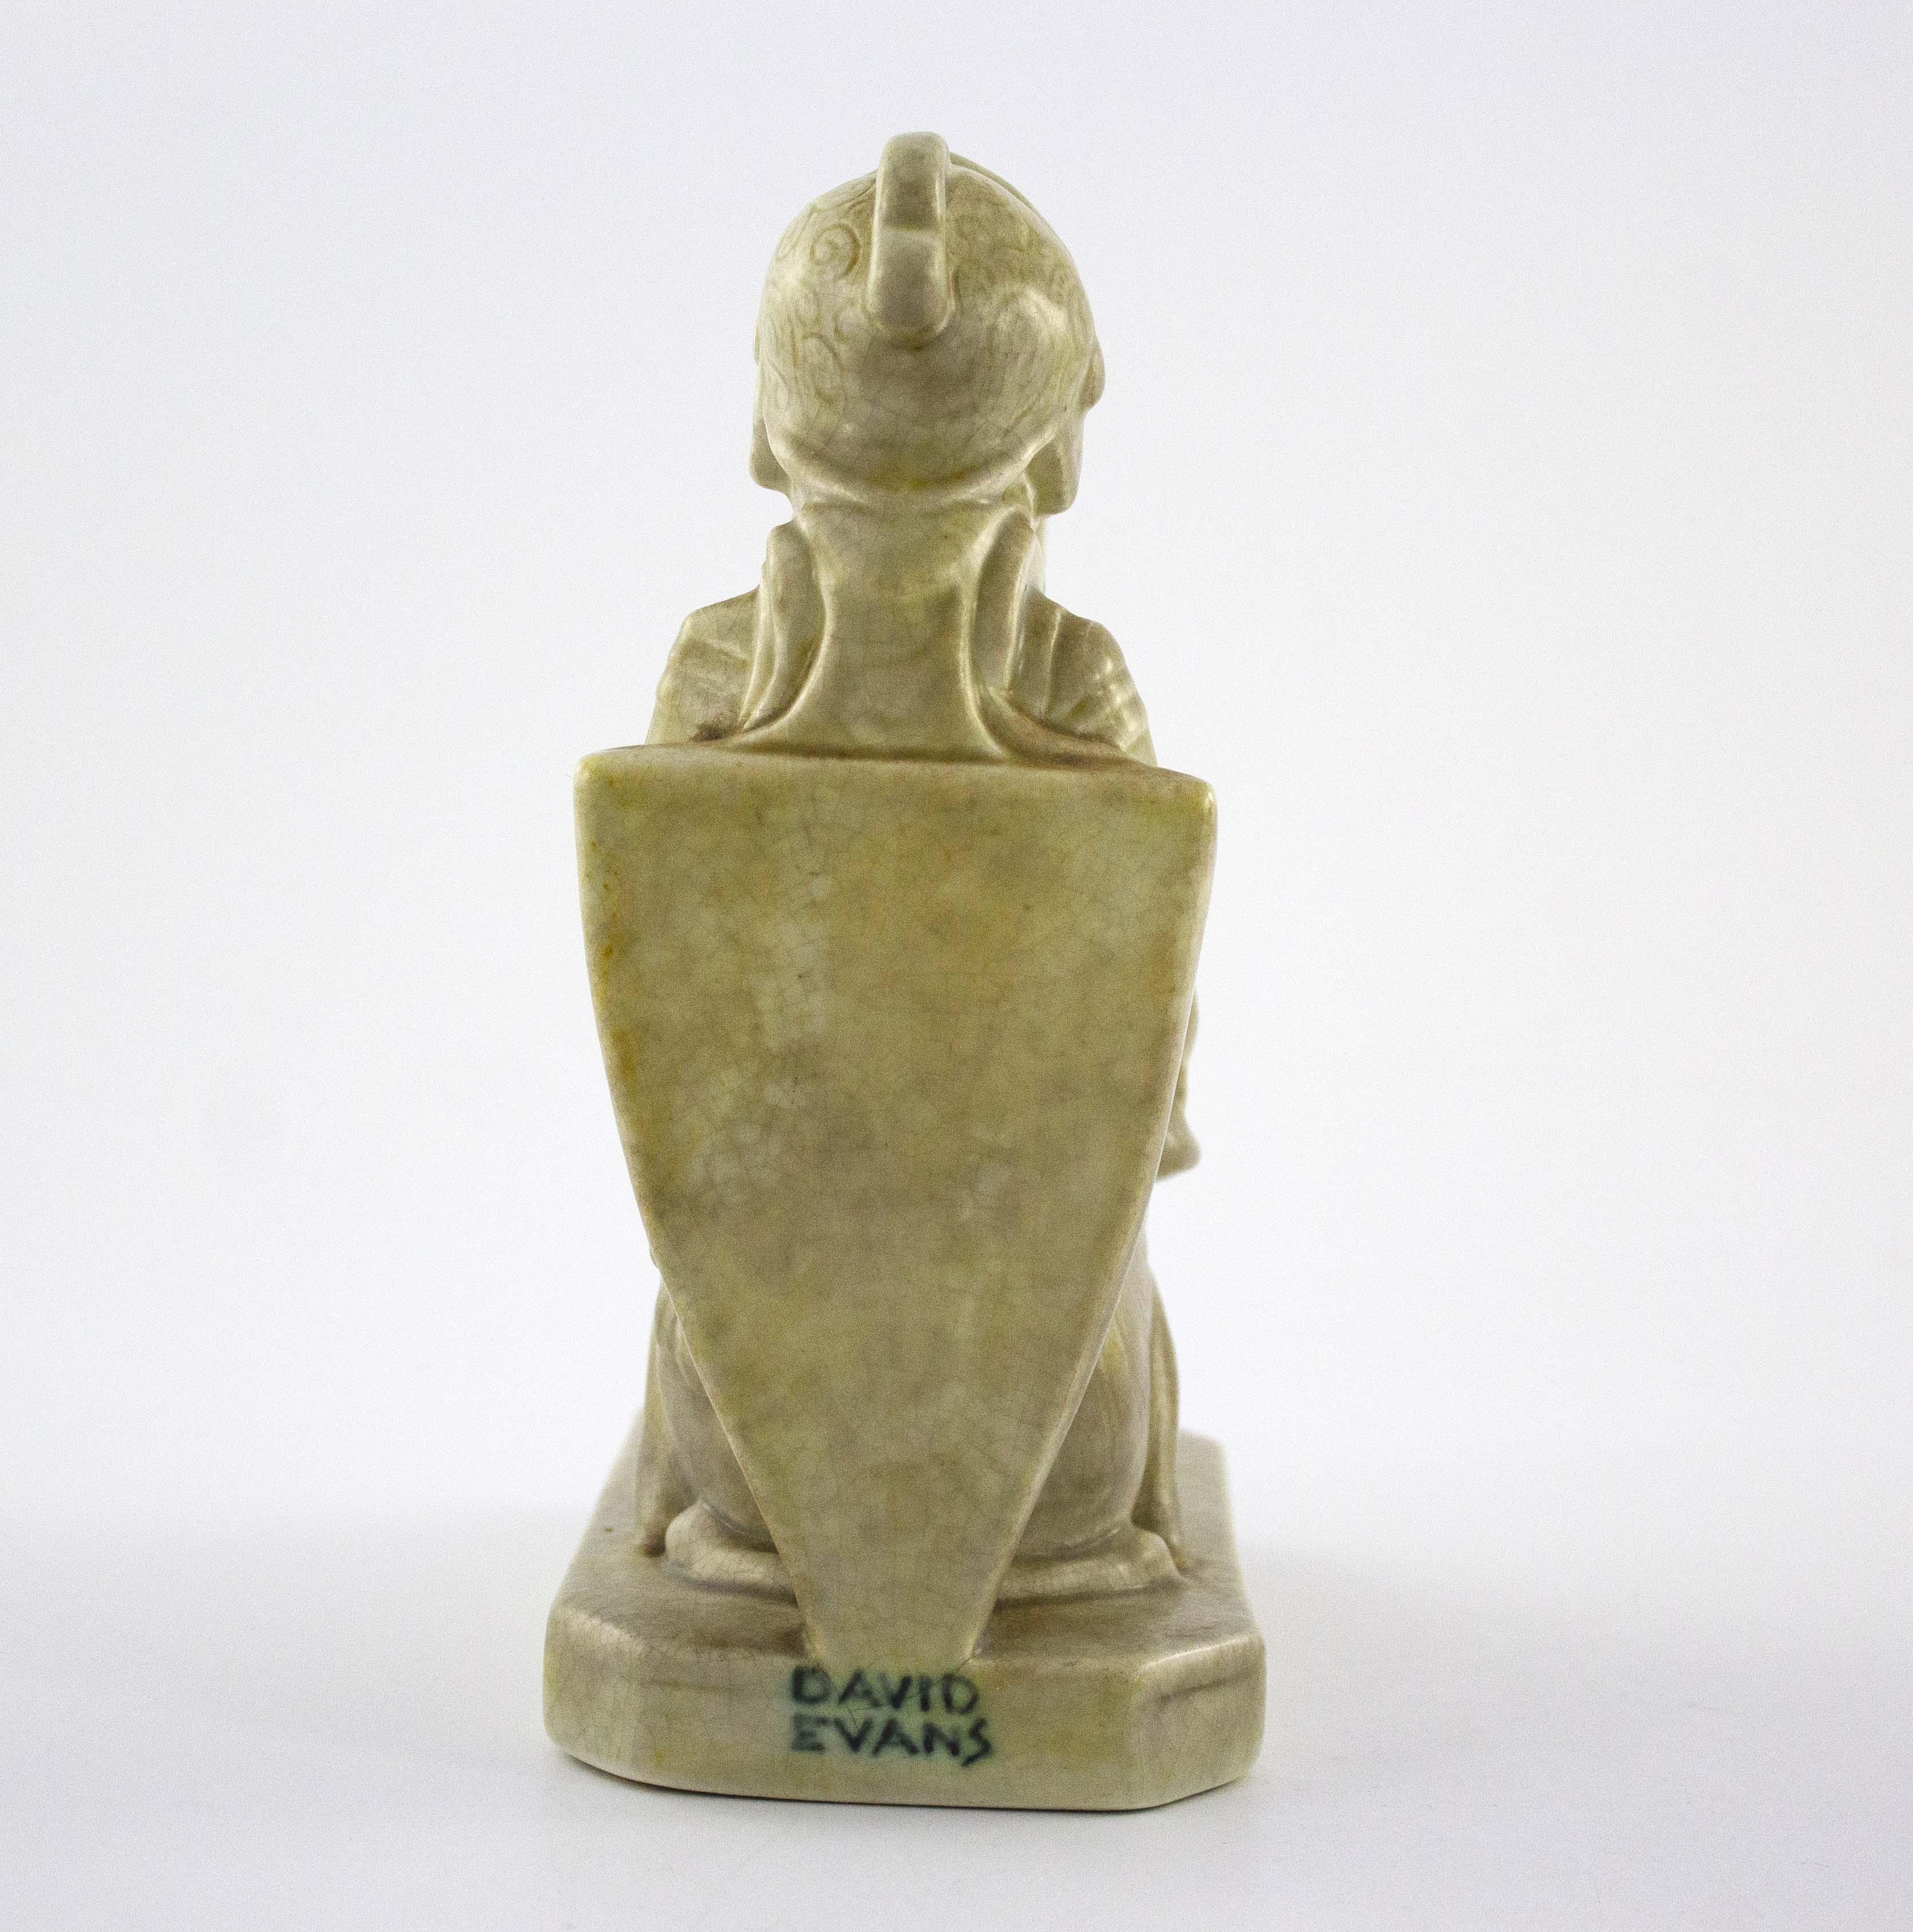 David Evans for Pilkington, a pair of Royal Lancas - Image 2 of 10